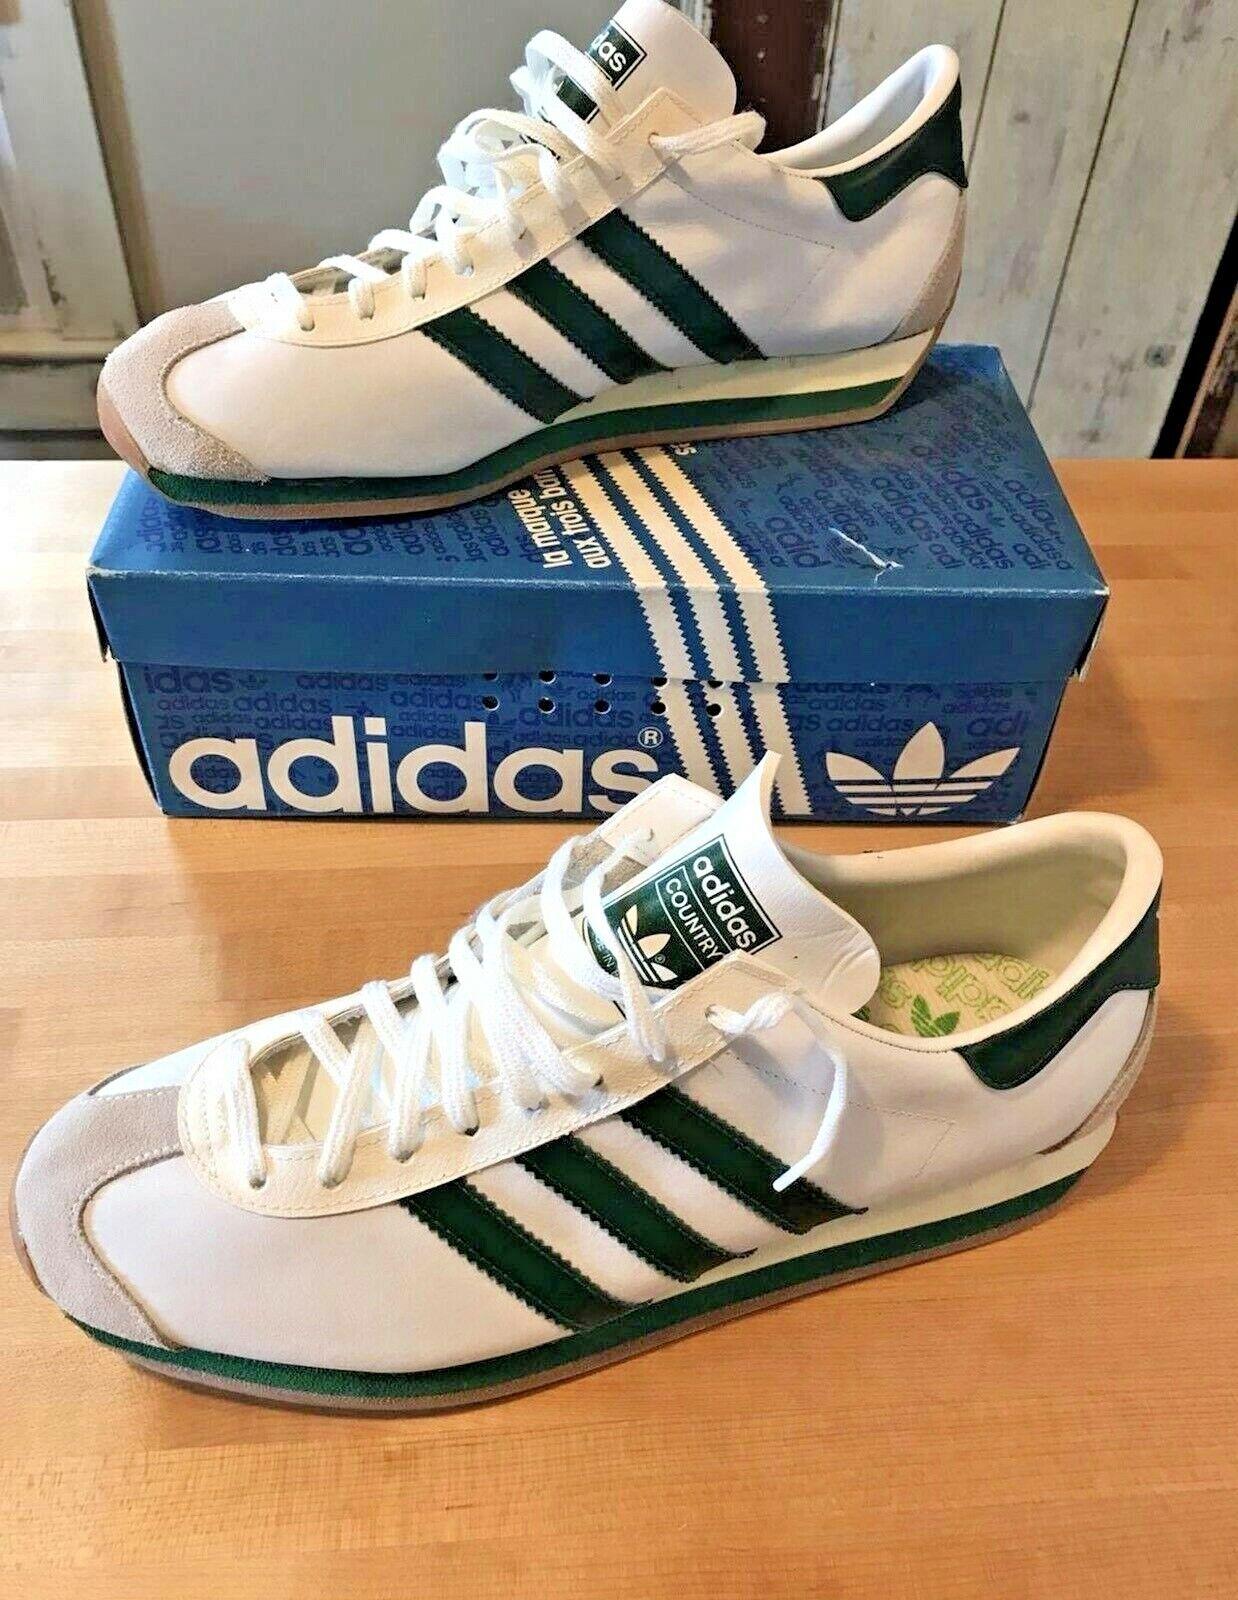 Vintage Adidas Country Sneakers | eBay